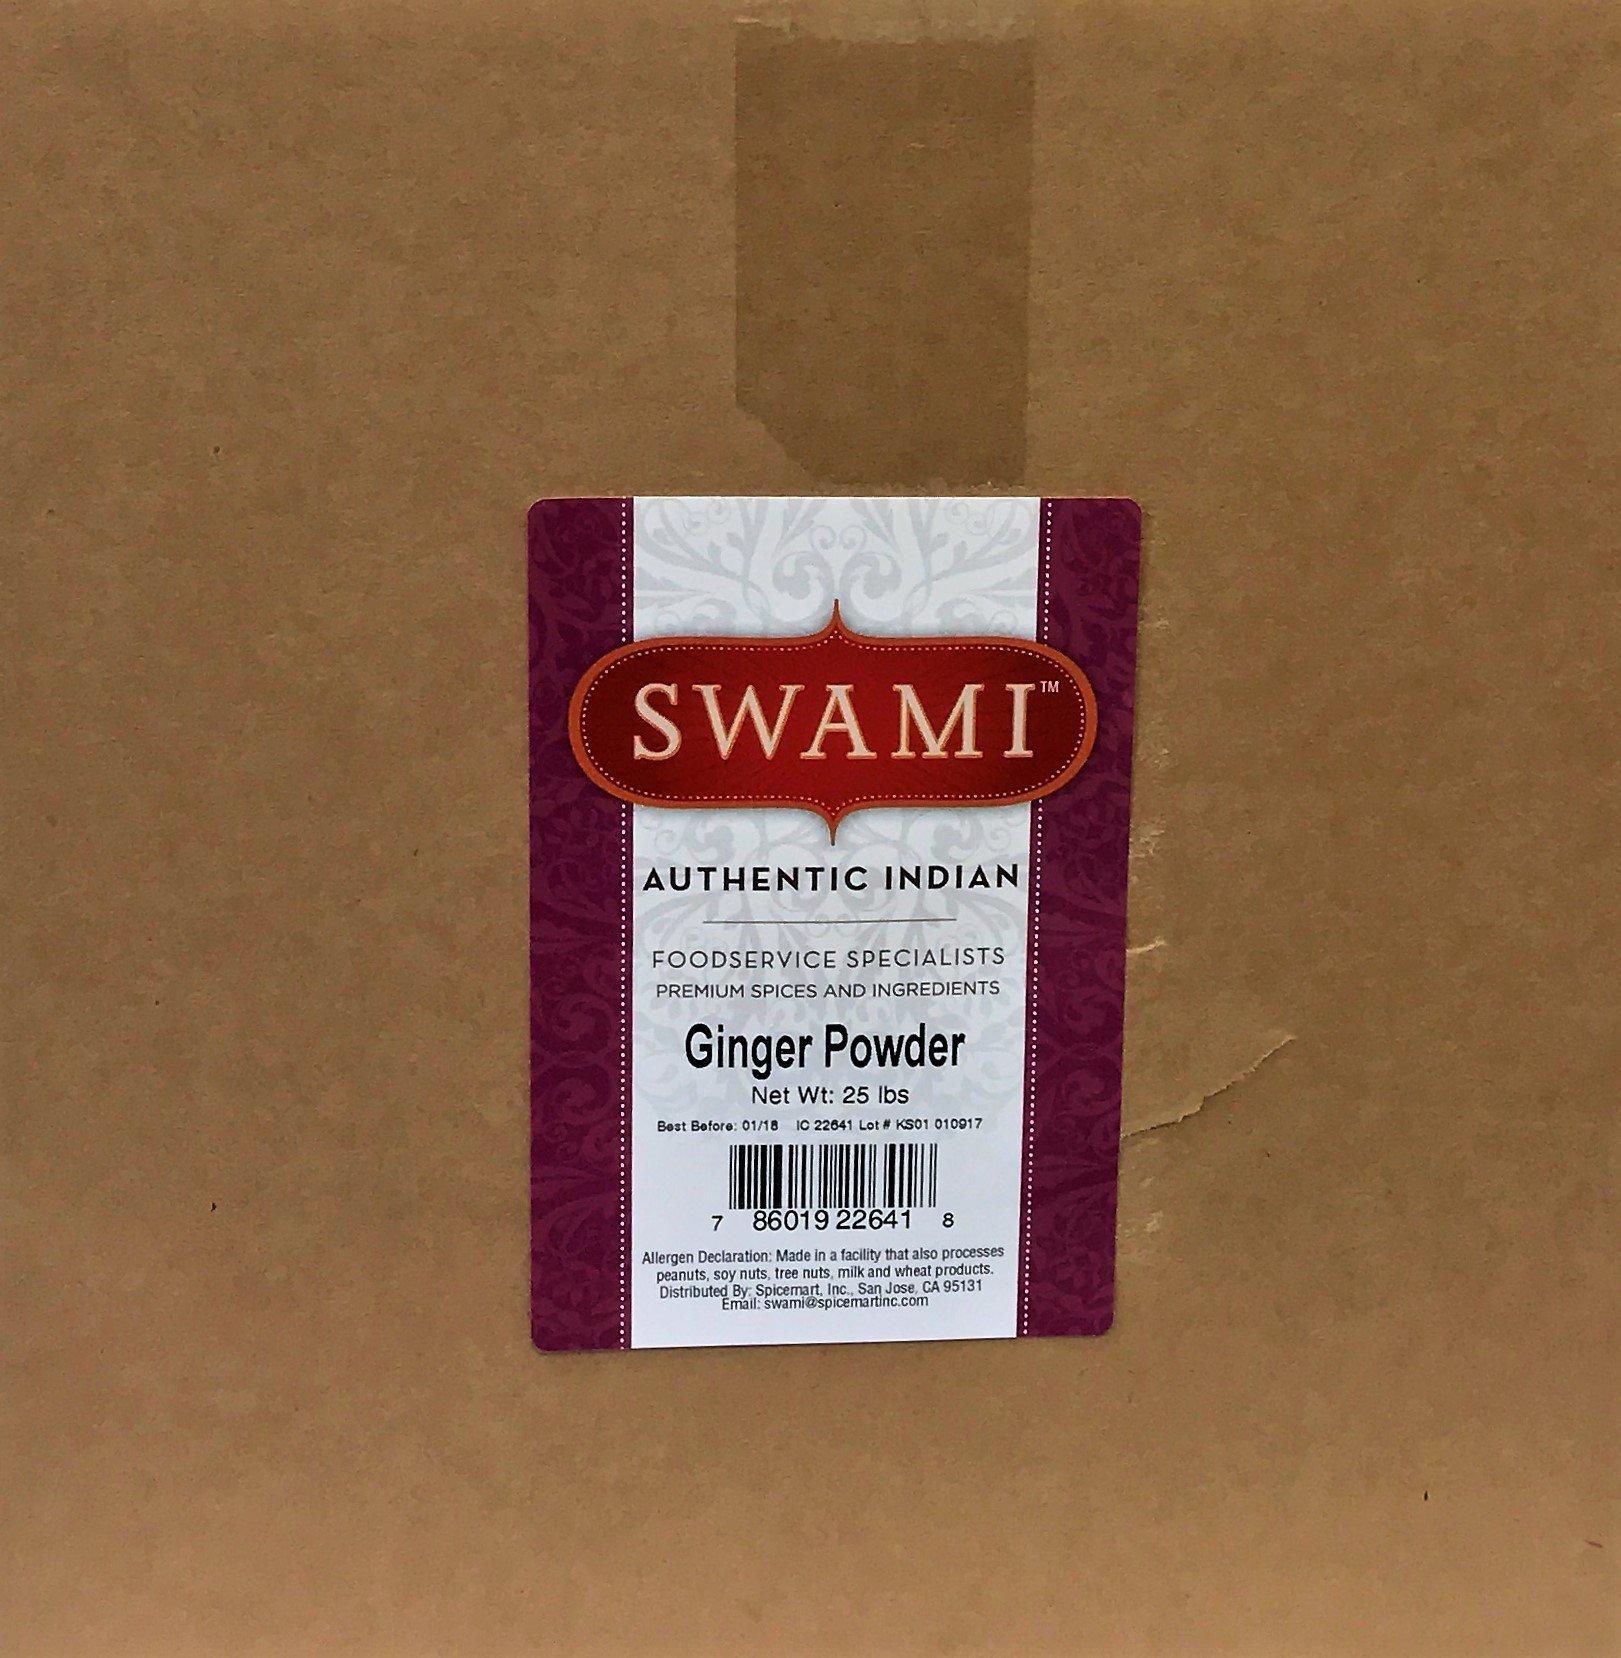 Swami Ginger Powder 25lb Box by Spicemart